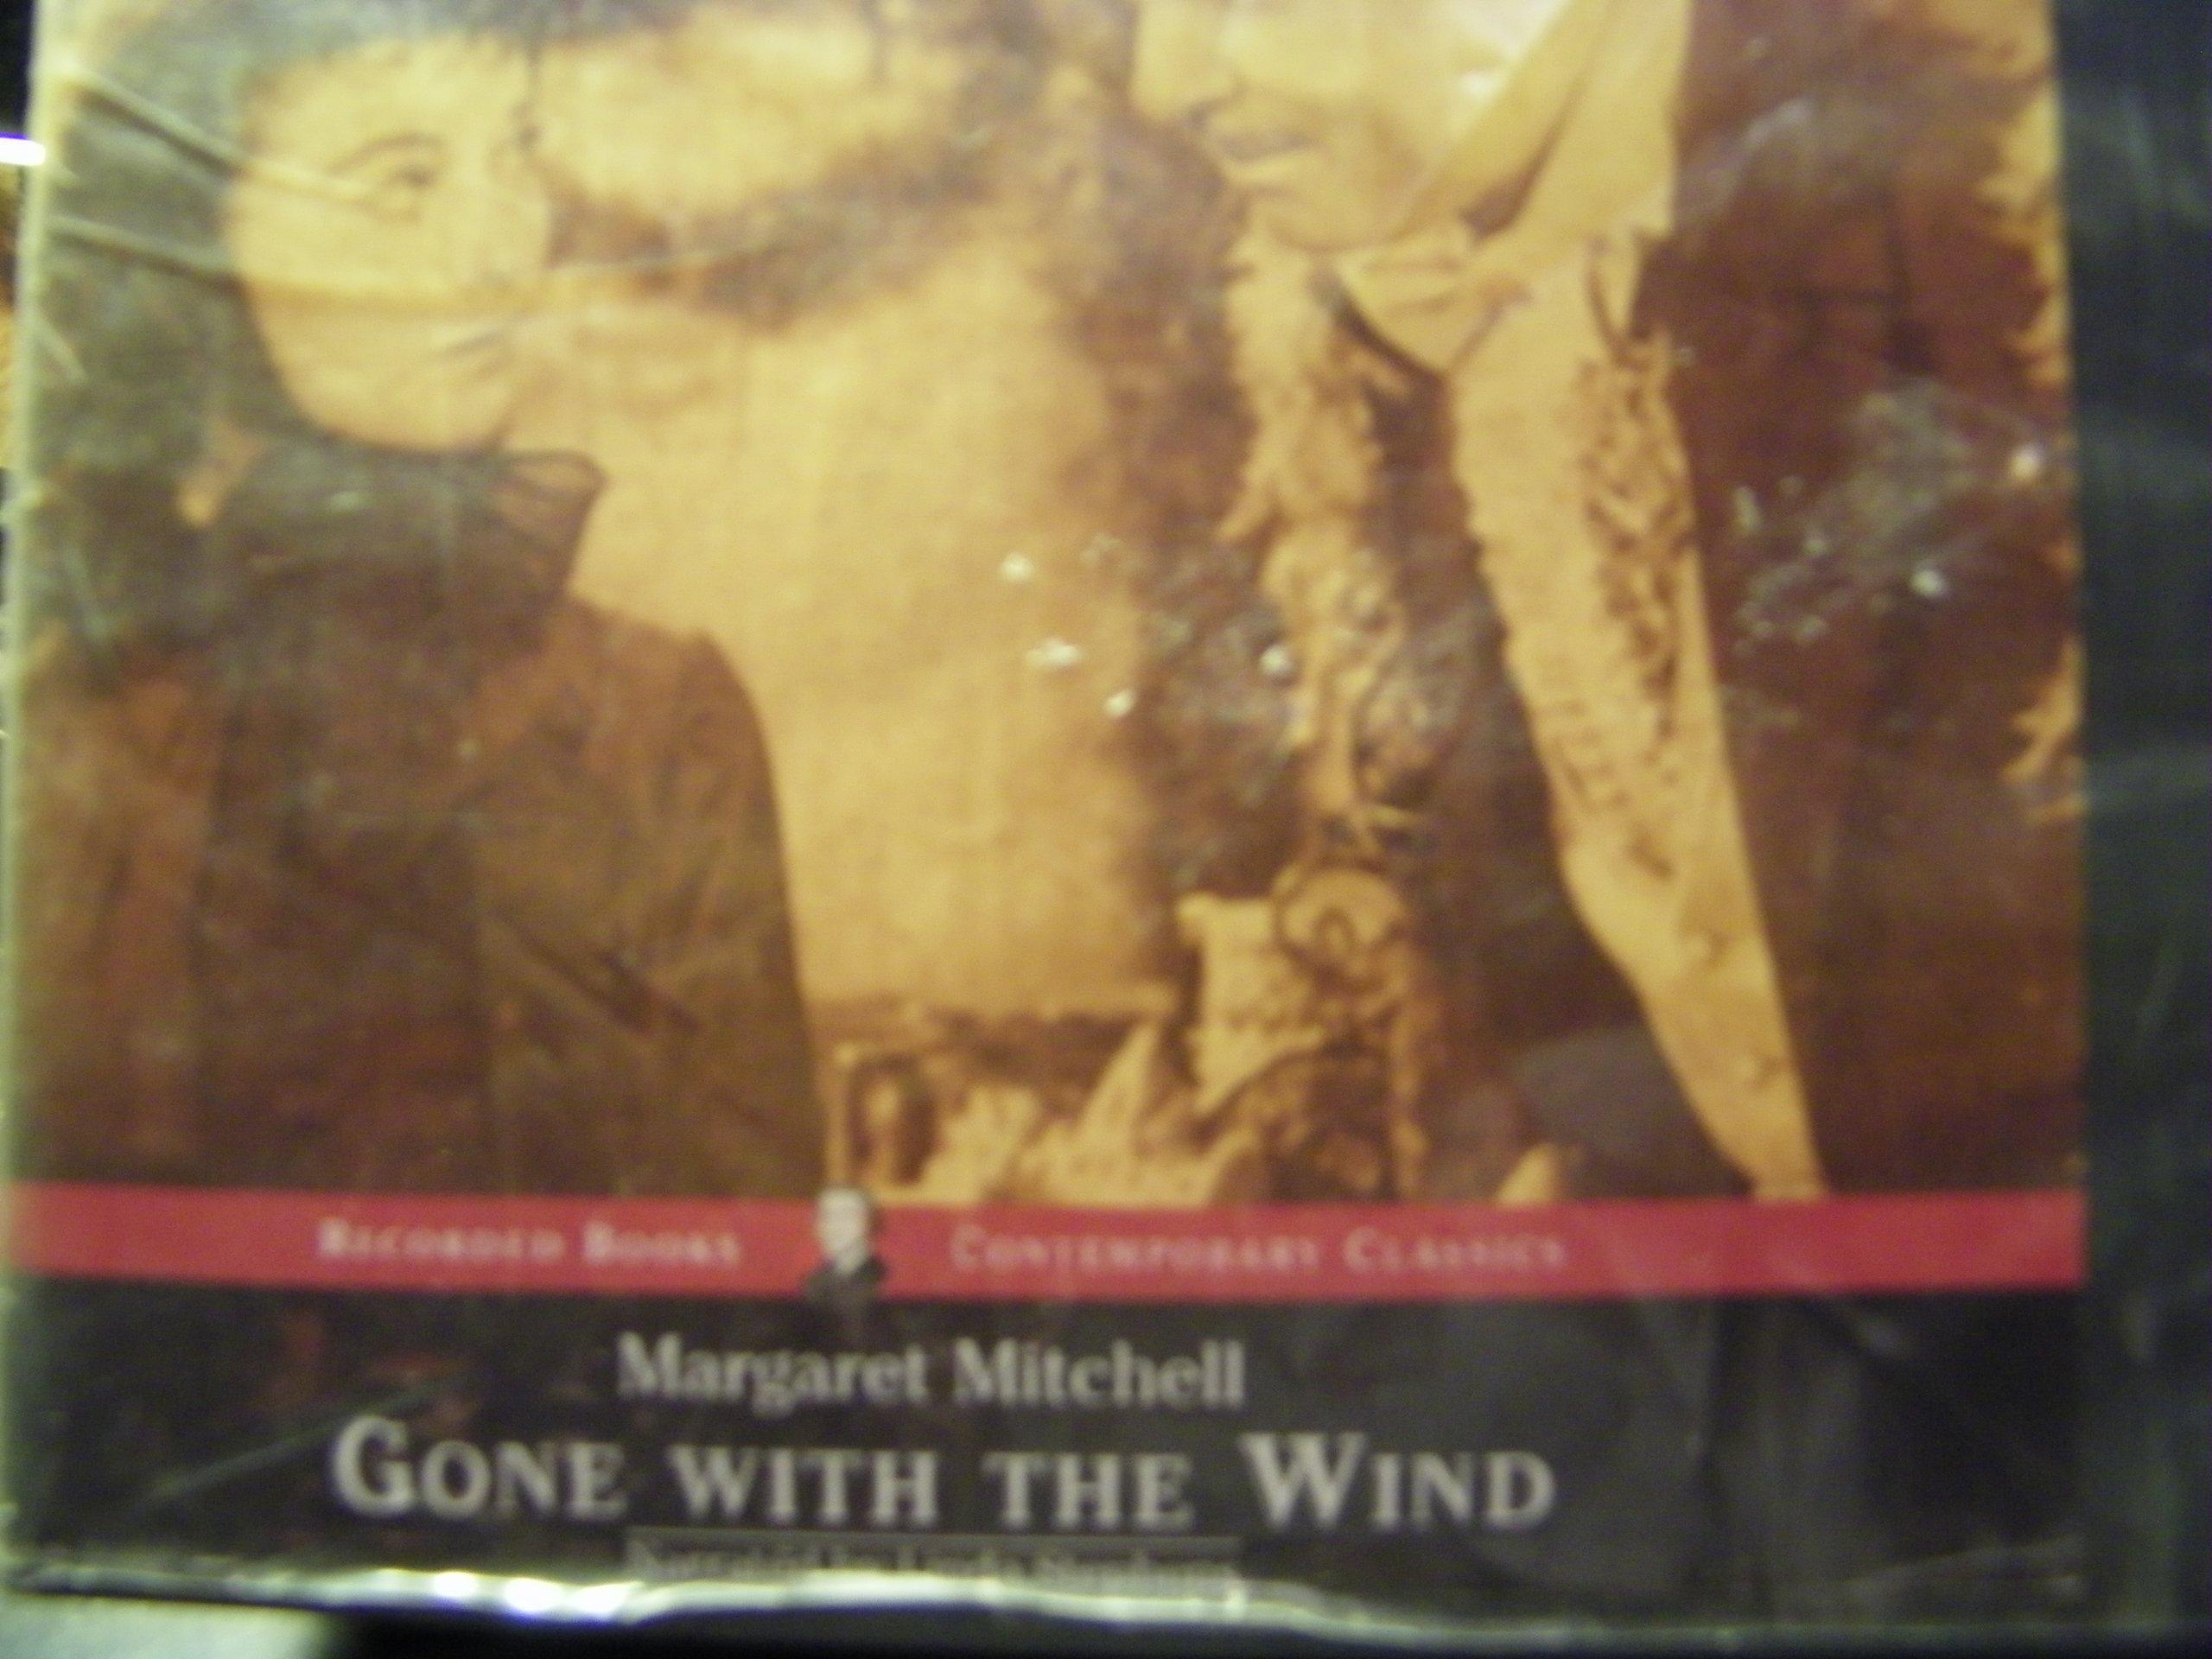 Gone With the Wind by Margaret Mitchell Unabridged CD Audiobook: Amazon.es: Margaret Mitchell: Libros